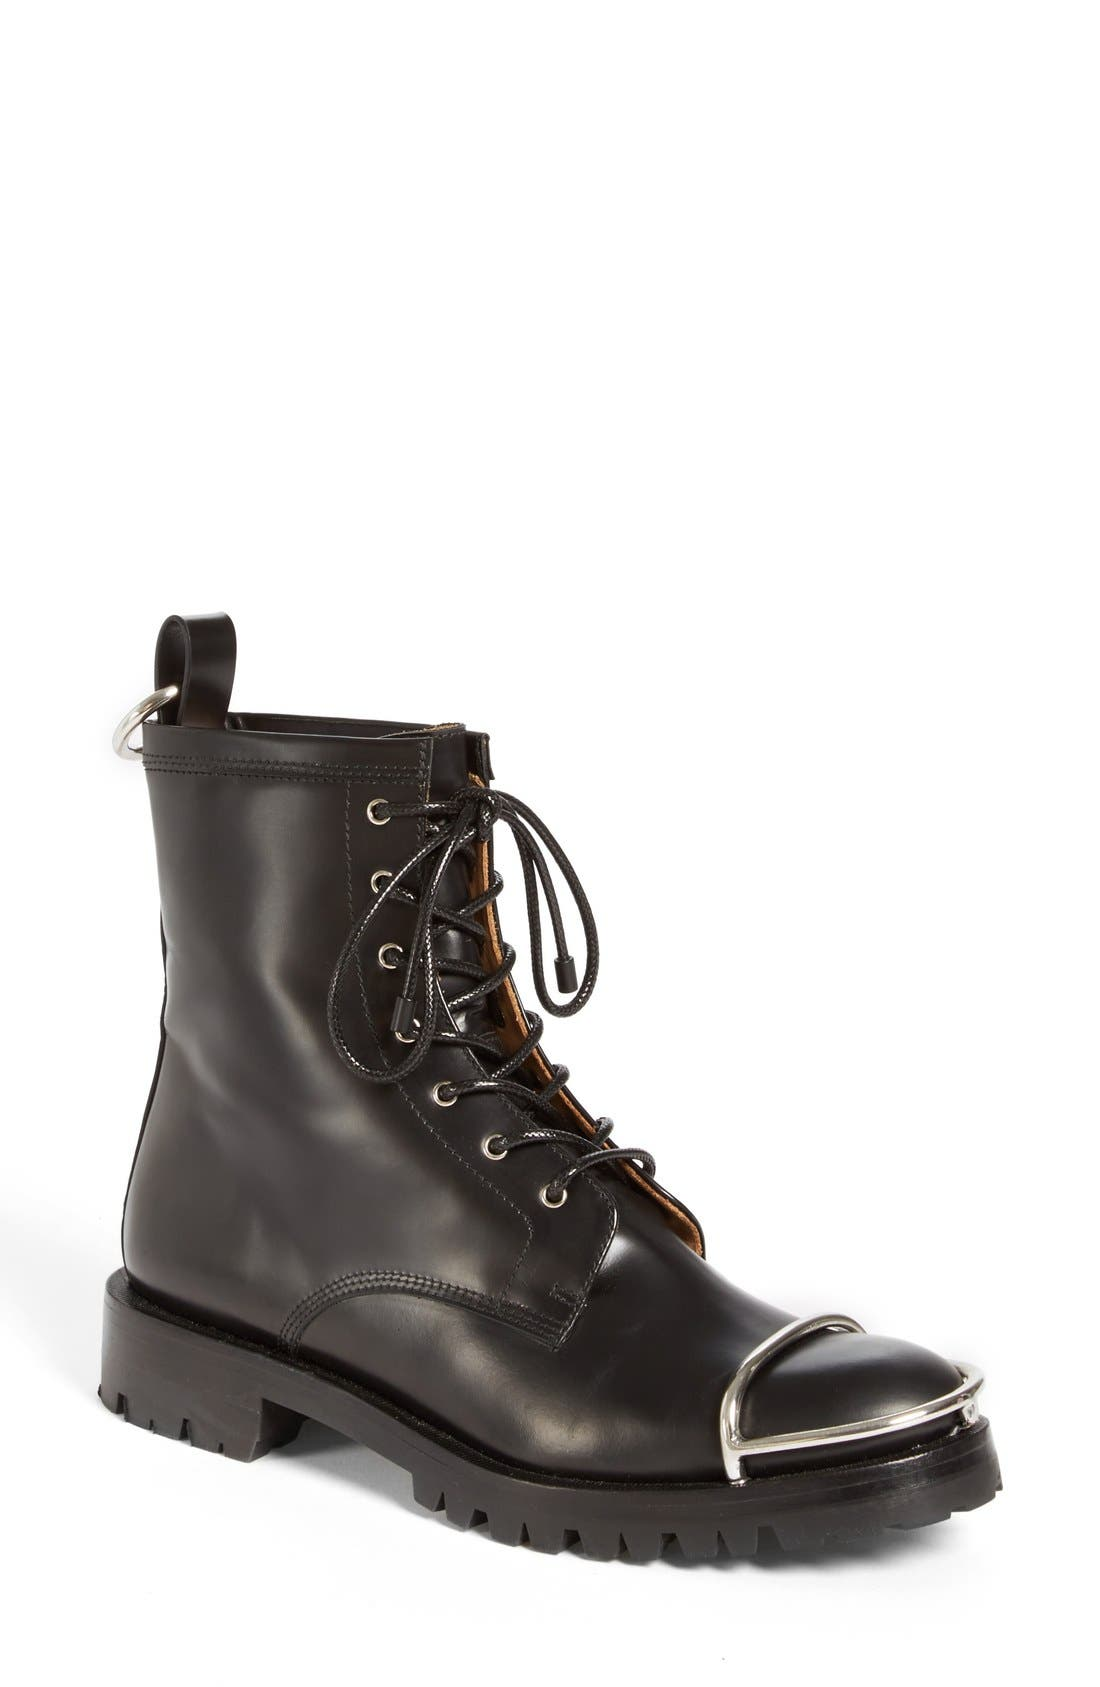 Main Image - Alexander Wang 'Lyndon' Military Boot (Women)